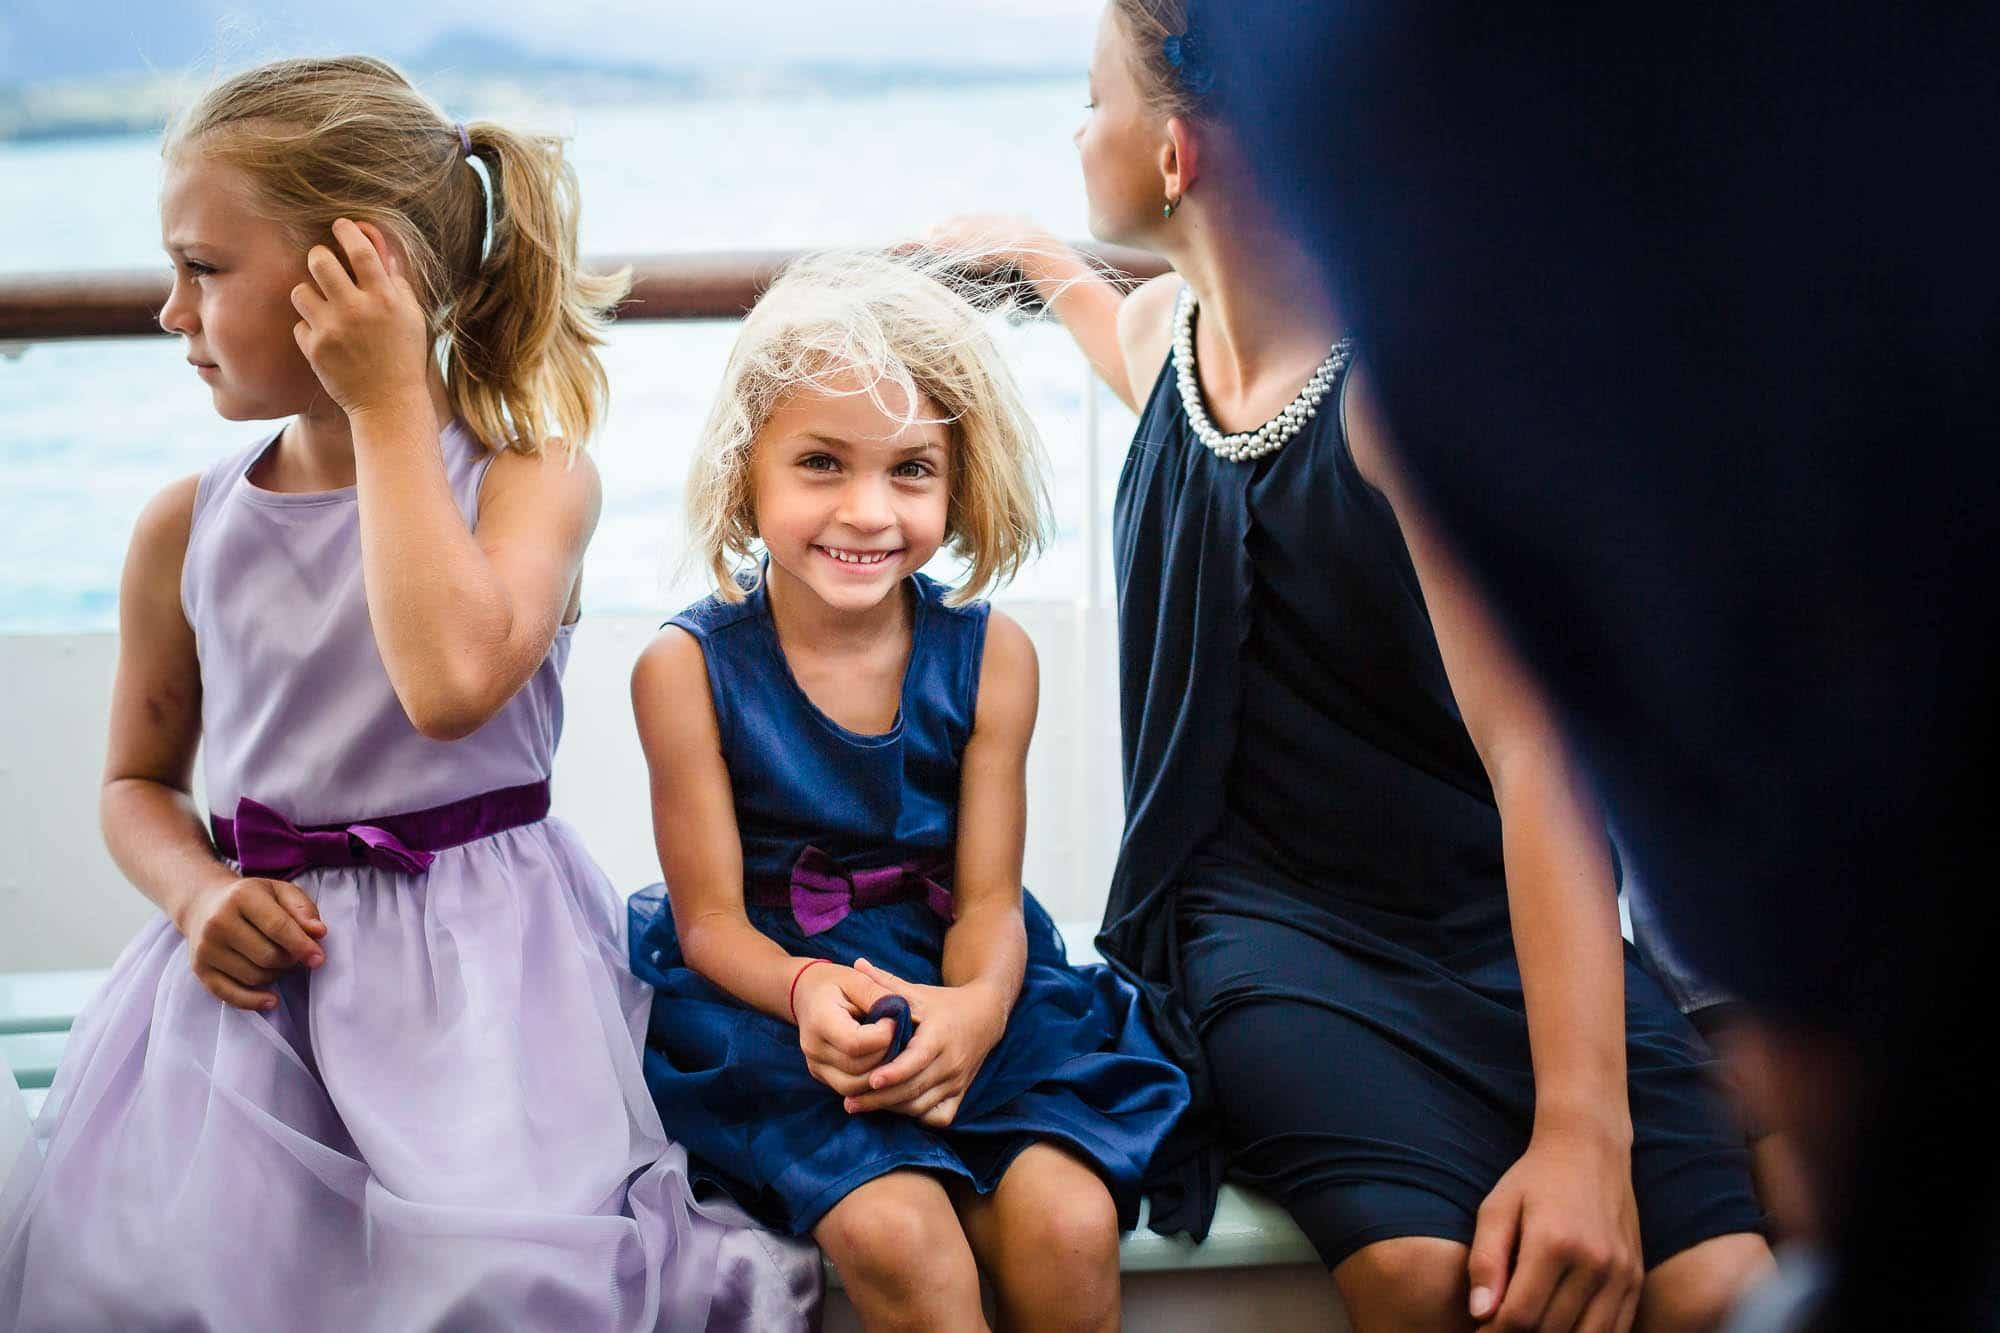 Mädchen lächelt